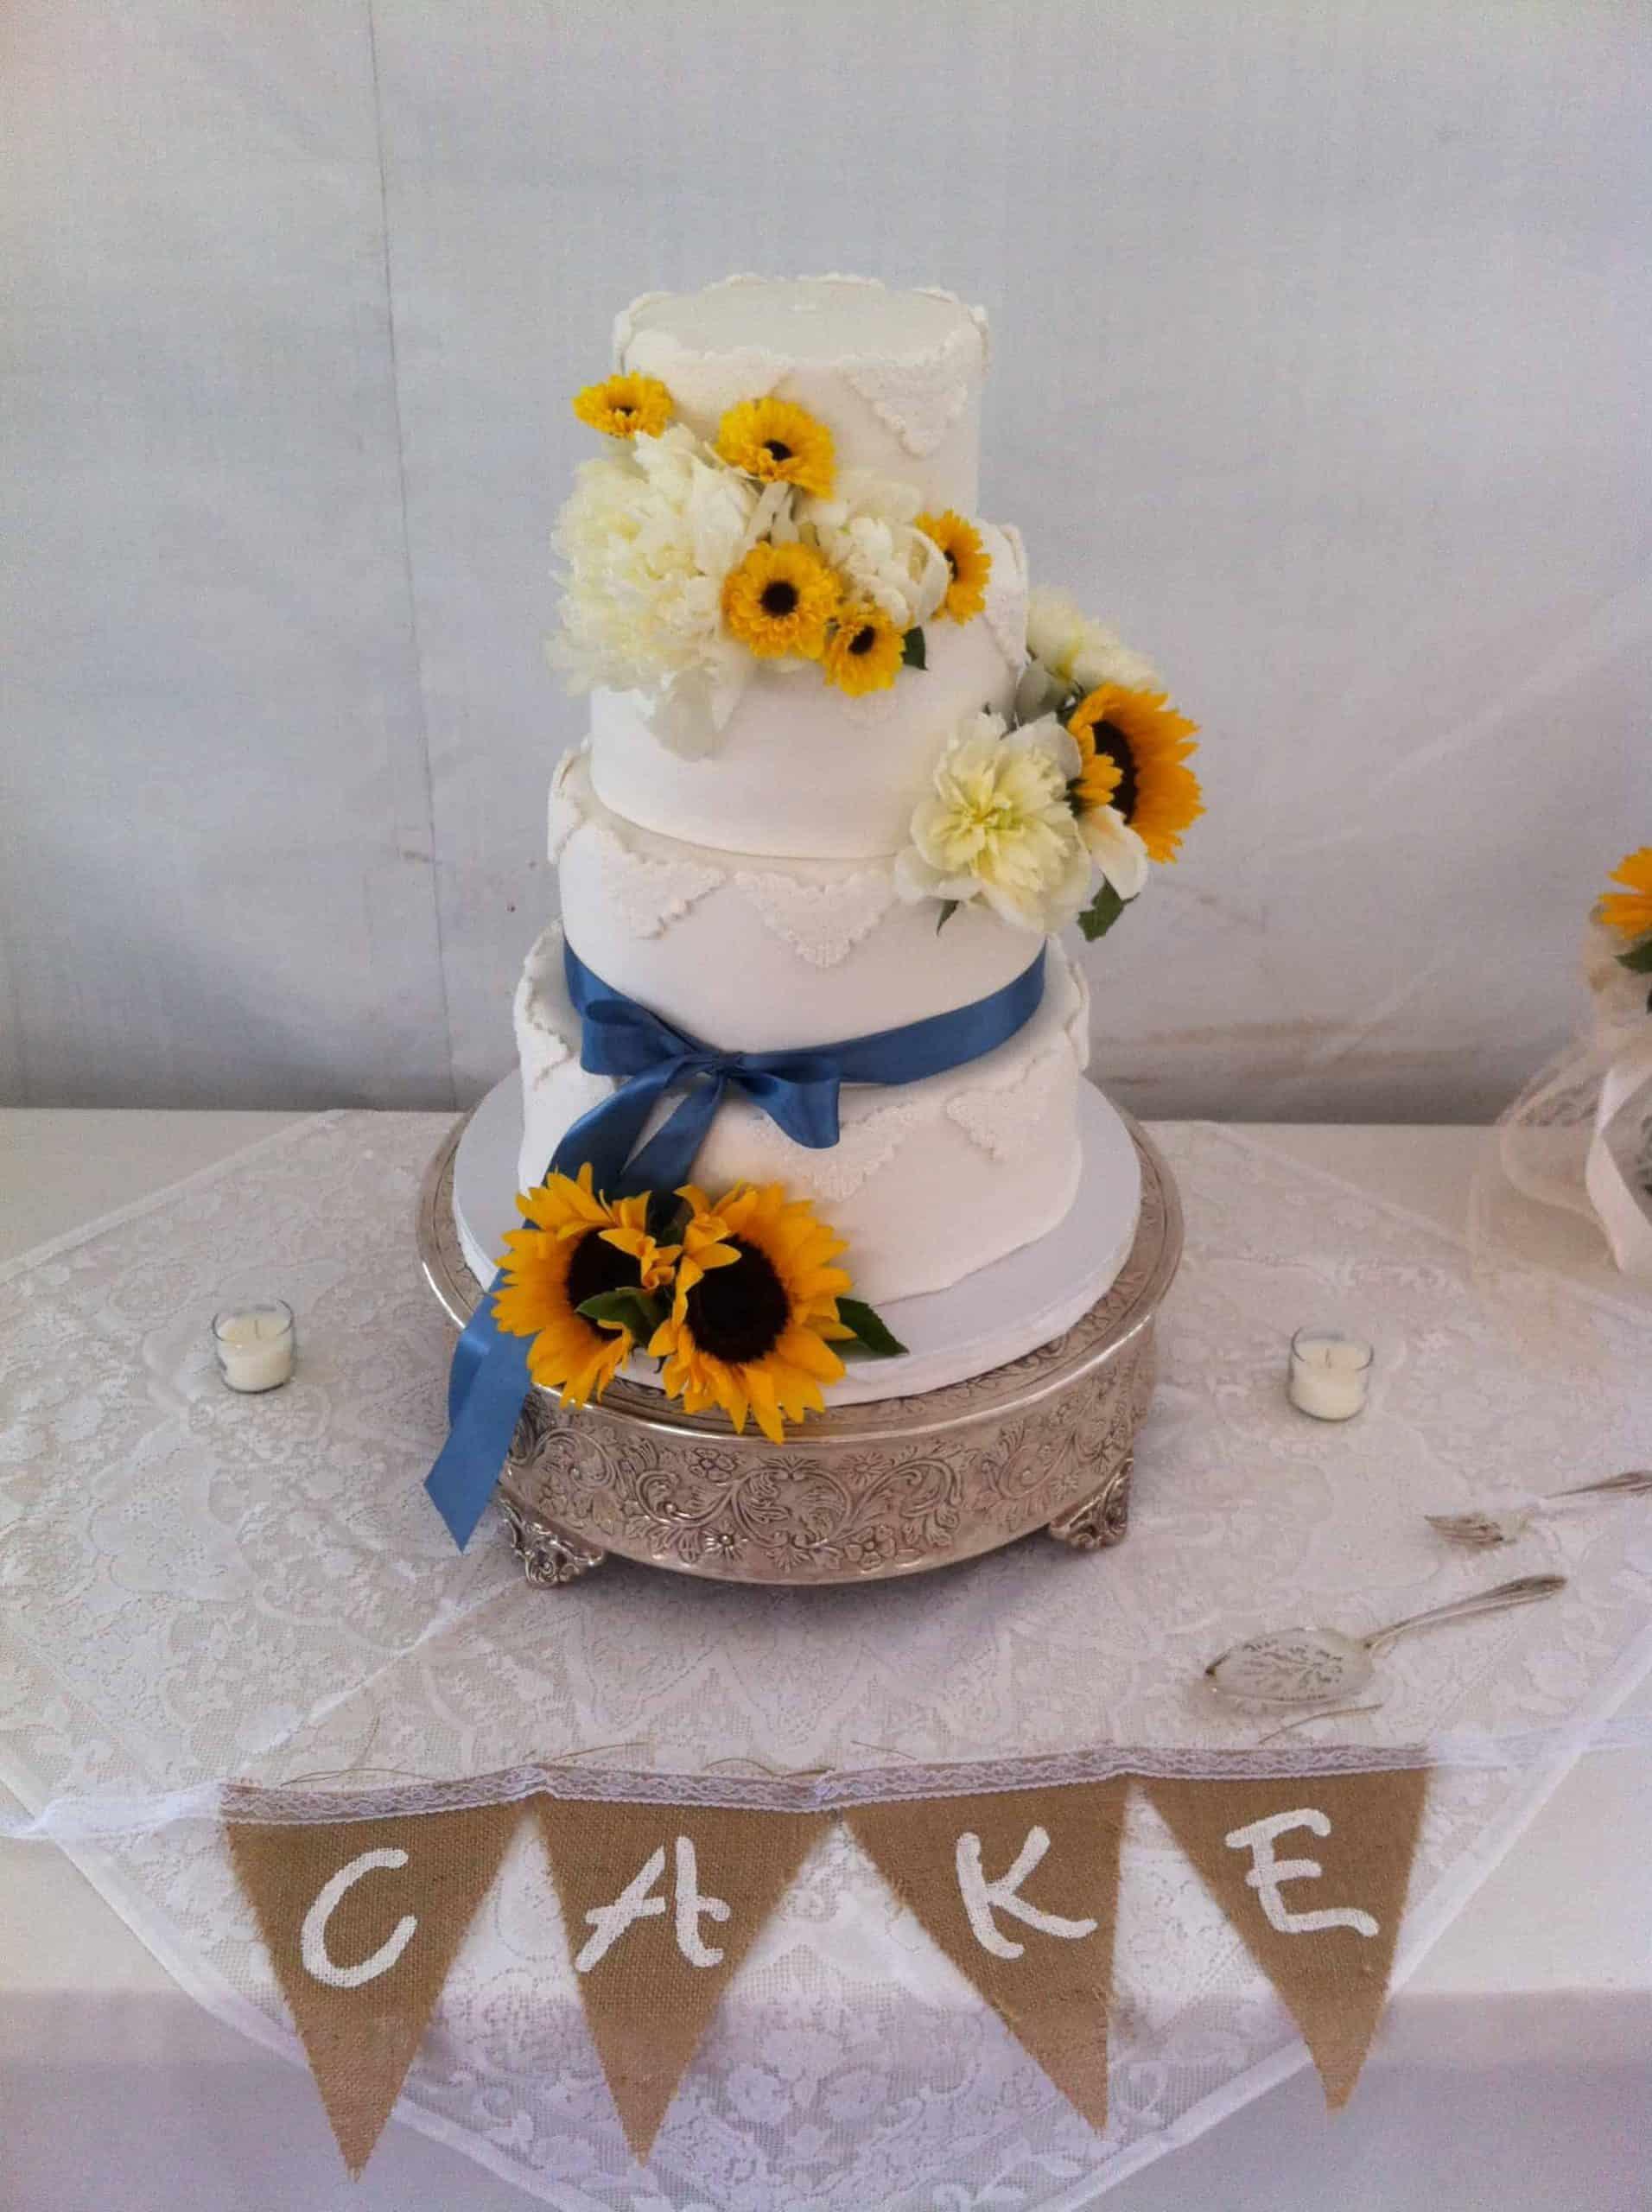 The Makery Cake Company Burlap and Lace Wedding Cake